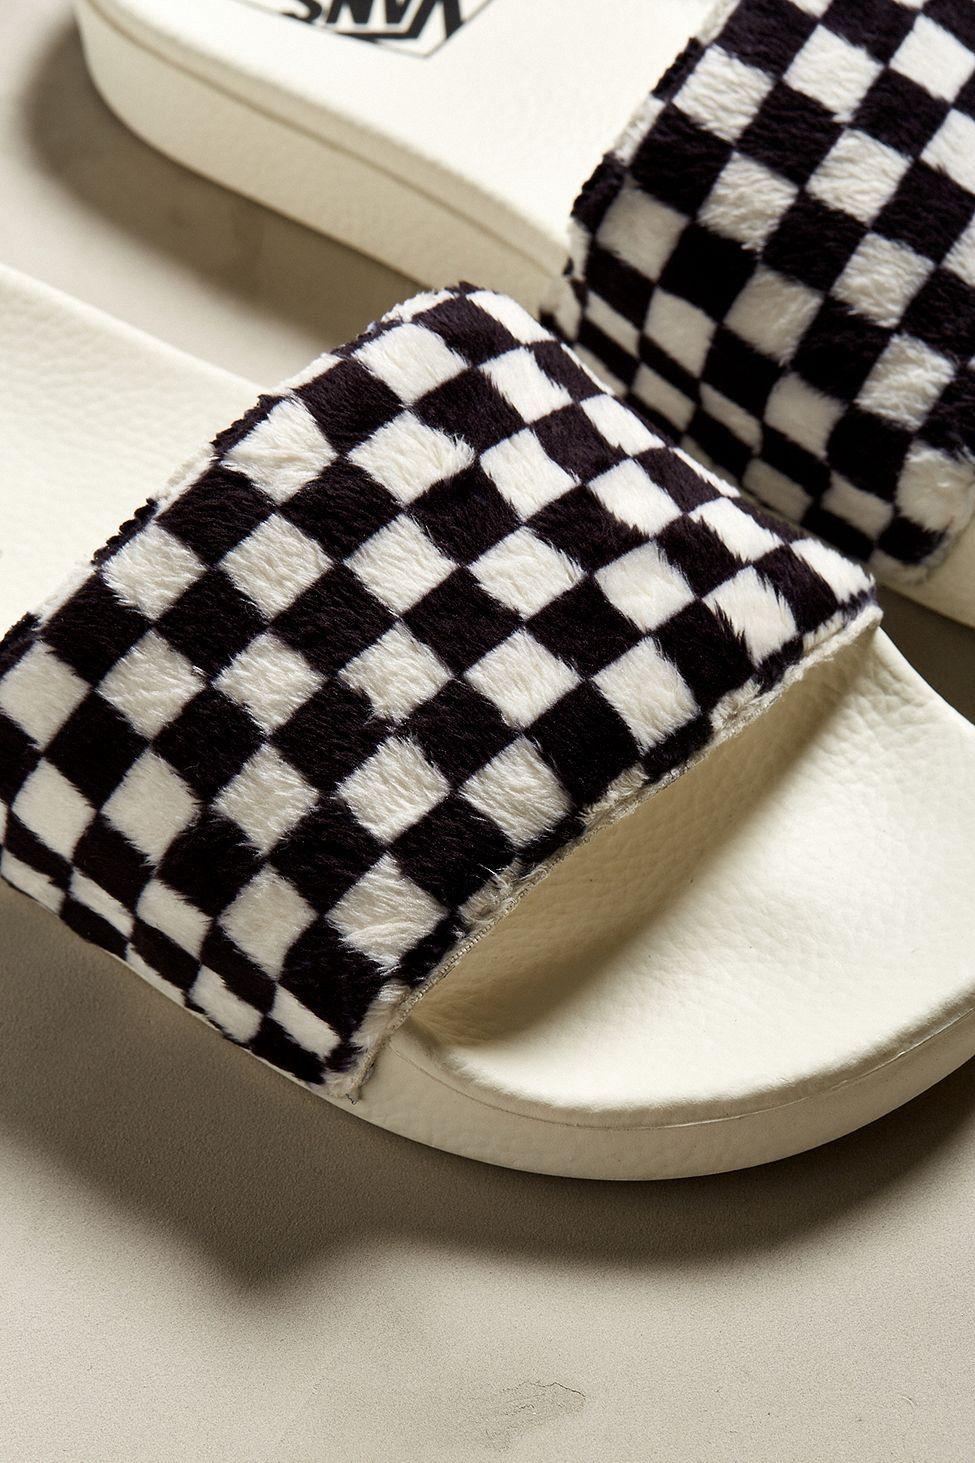 7860395da630 Urban Outfitters Vans Slide-On Checkerboard Sherpa Sandal - M 10 W 11.5